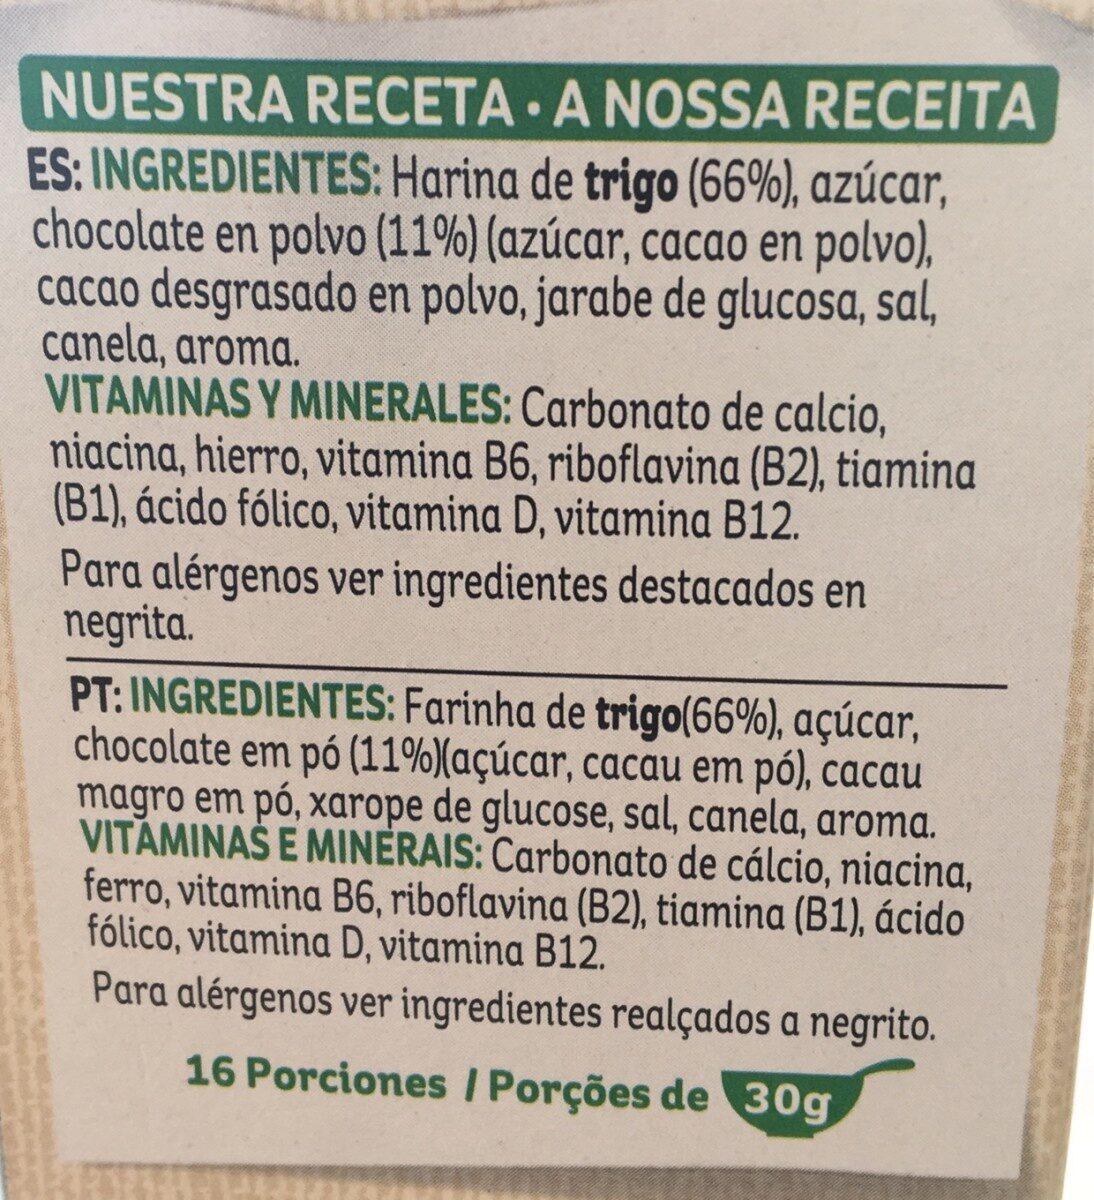 Choco krispies - Producto - fr